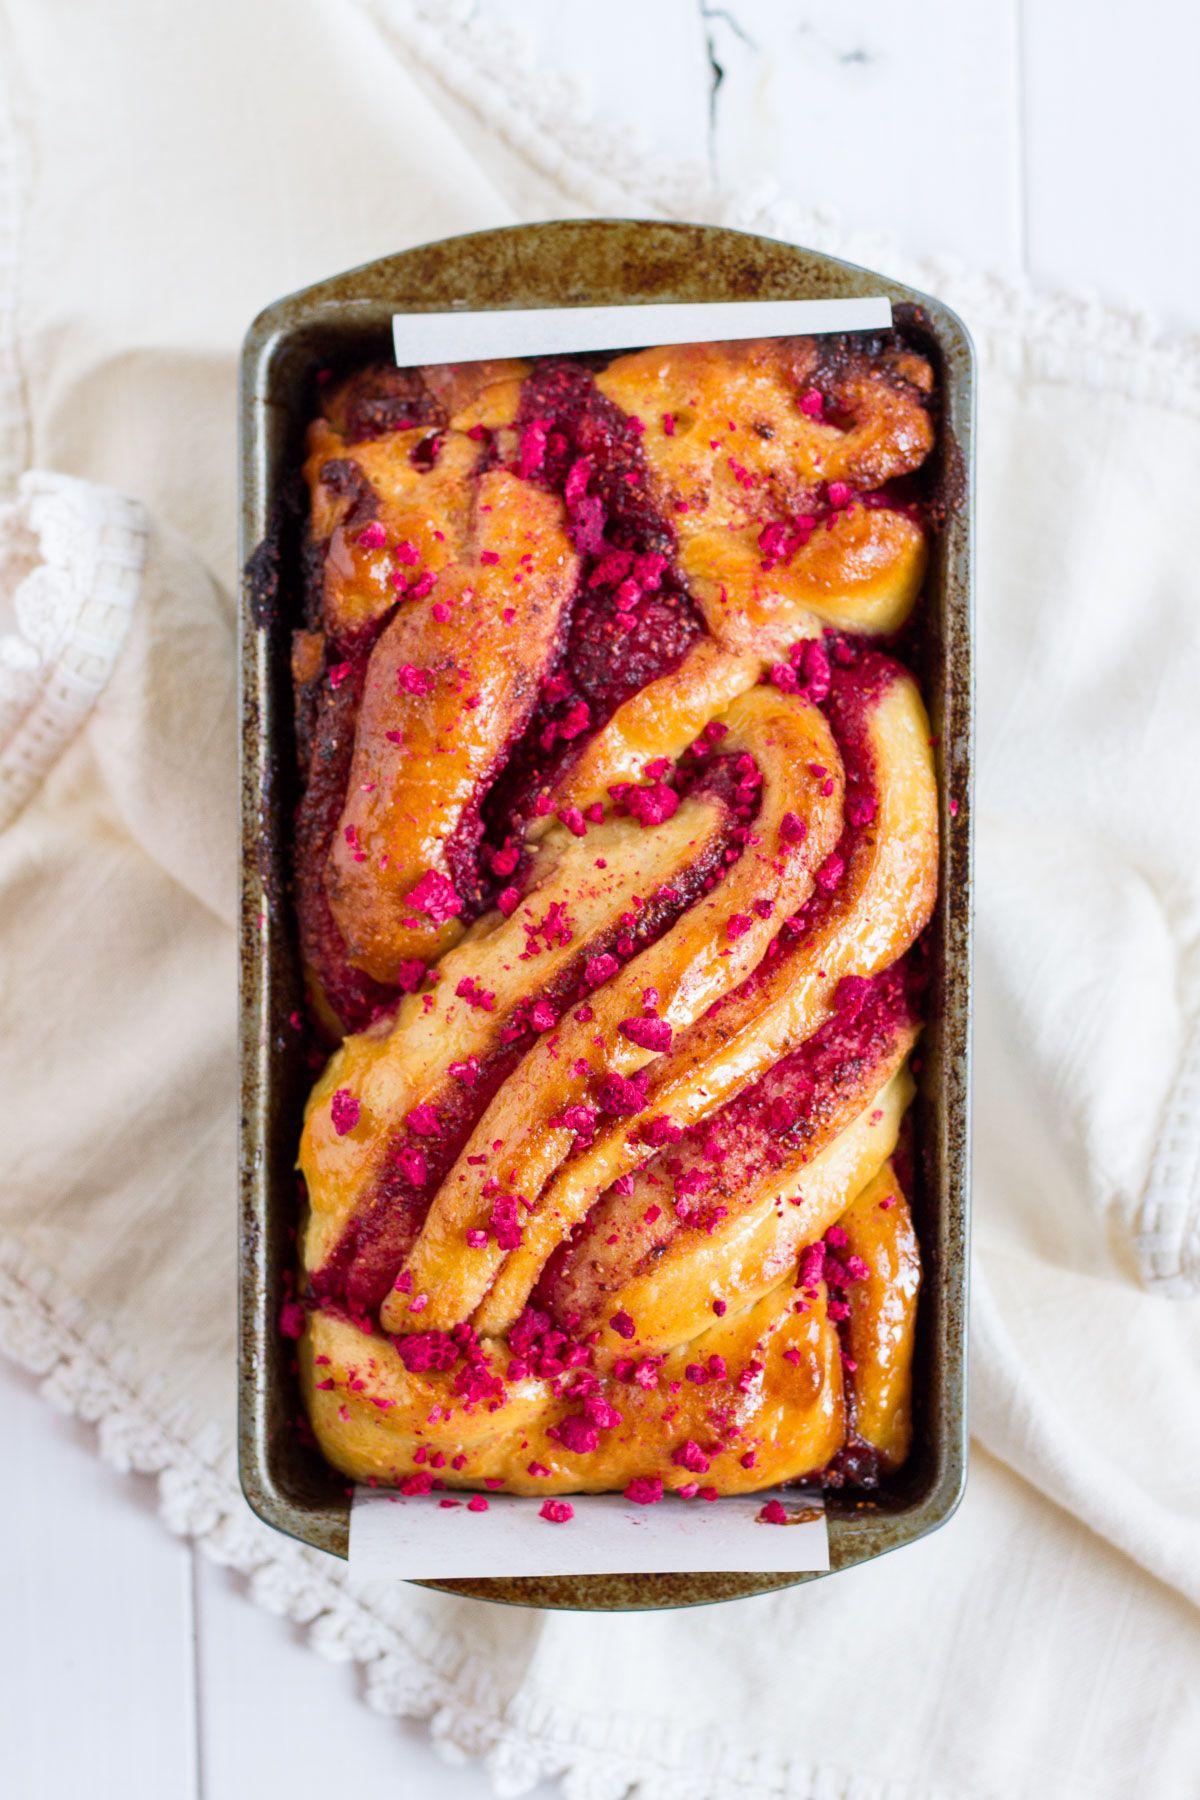 Raspberry Swirl Brioche #freezedriedraspberries